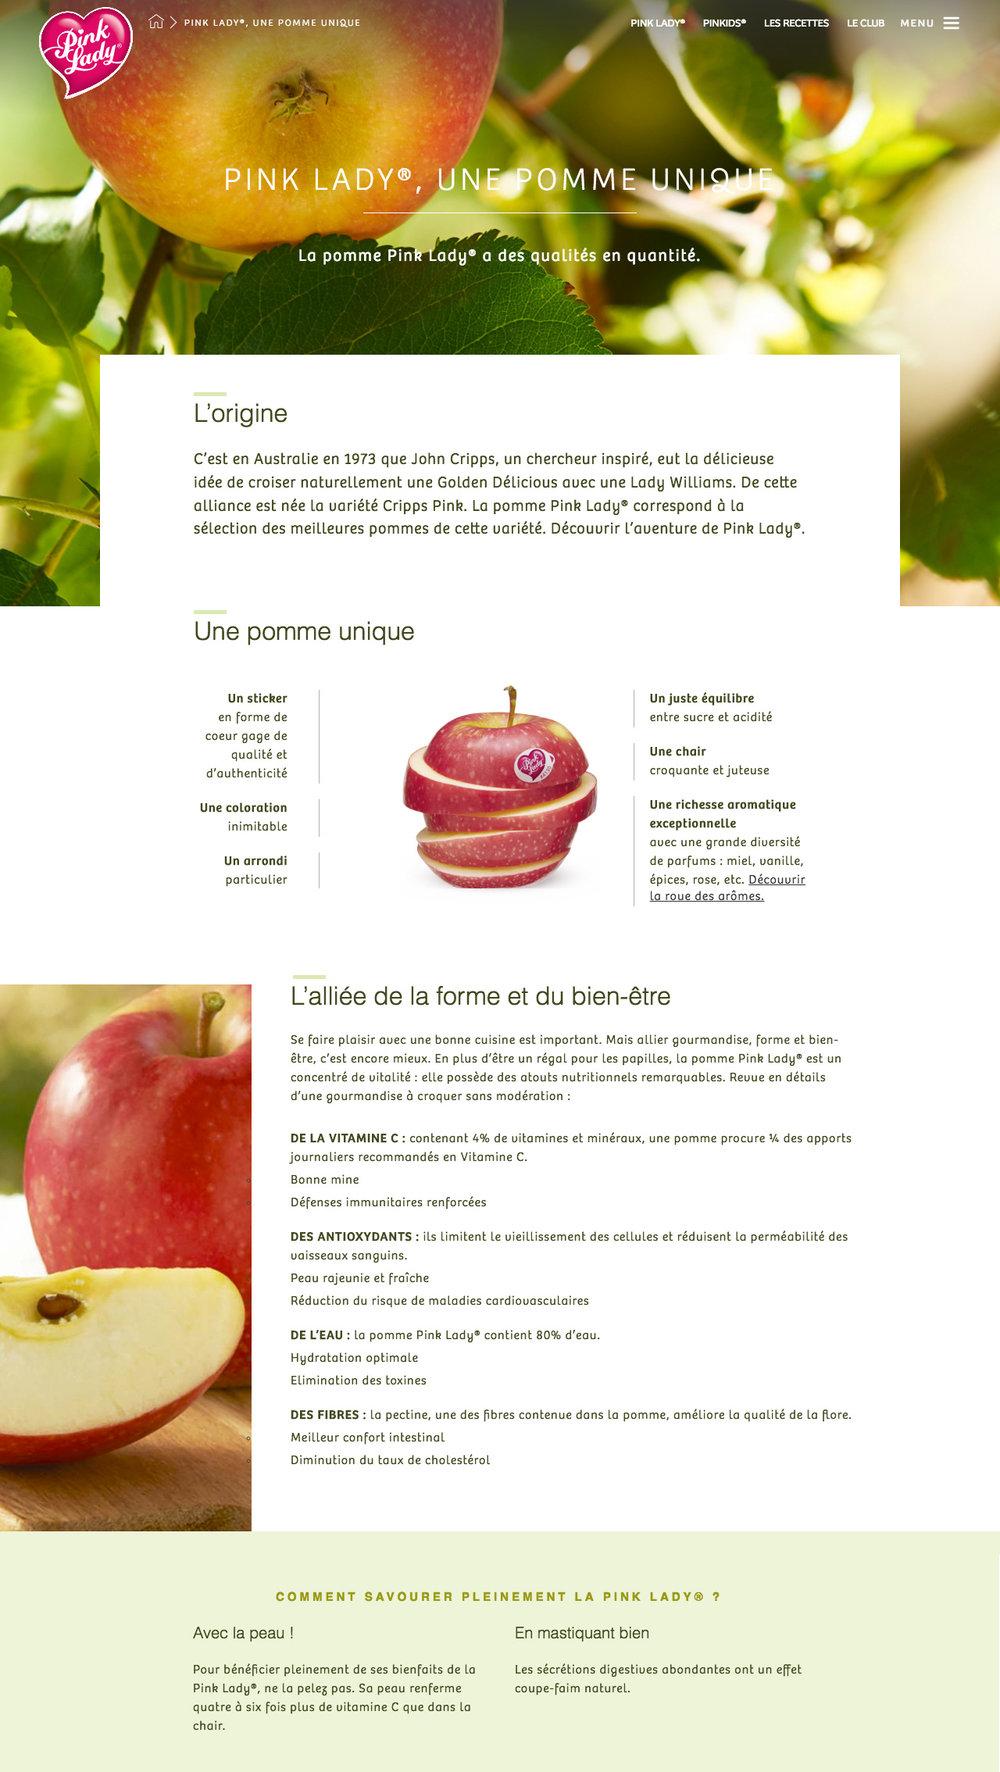 PL_website_1.jpg